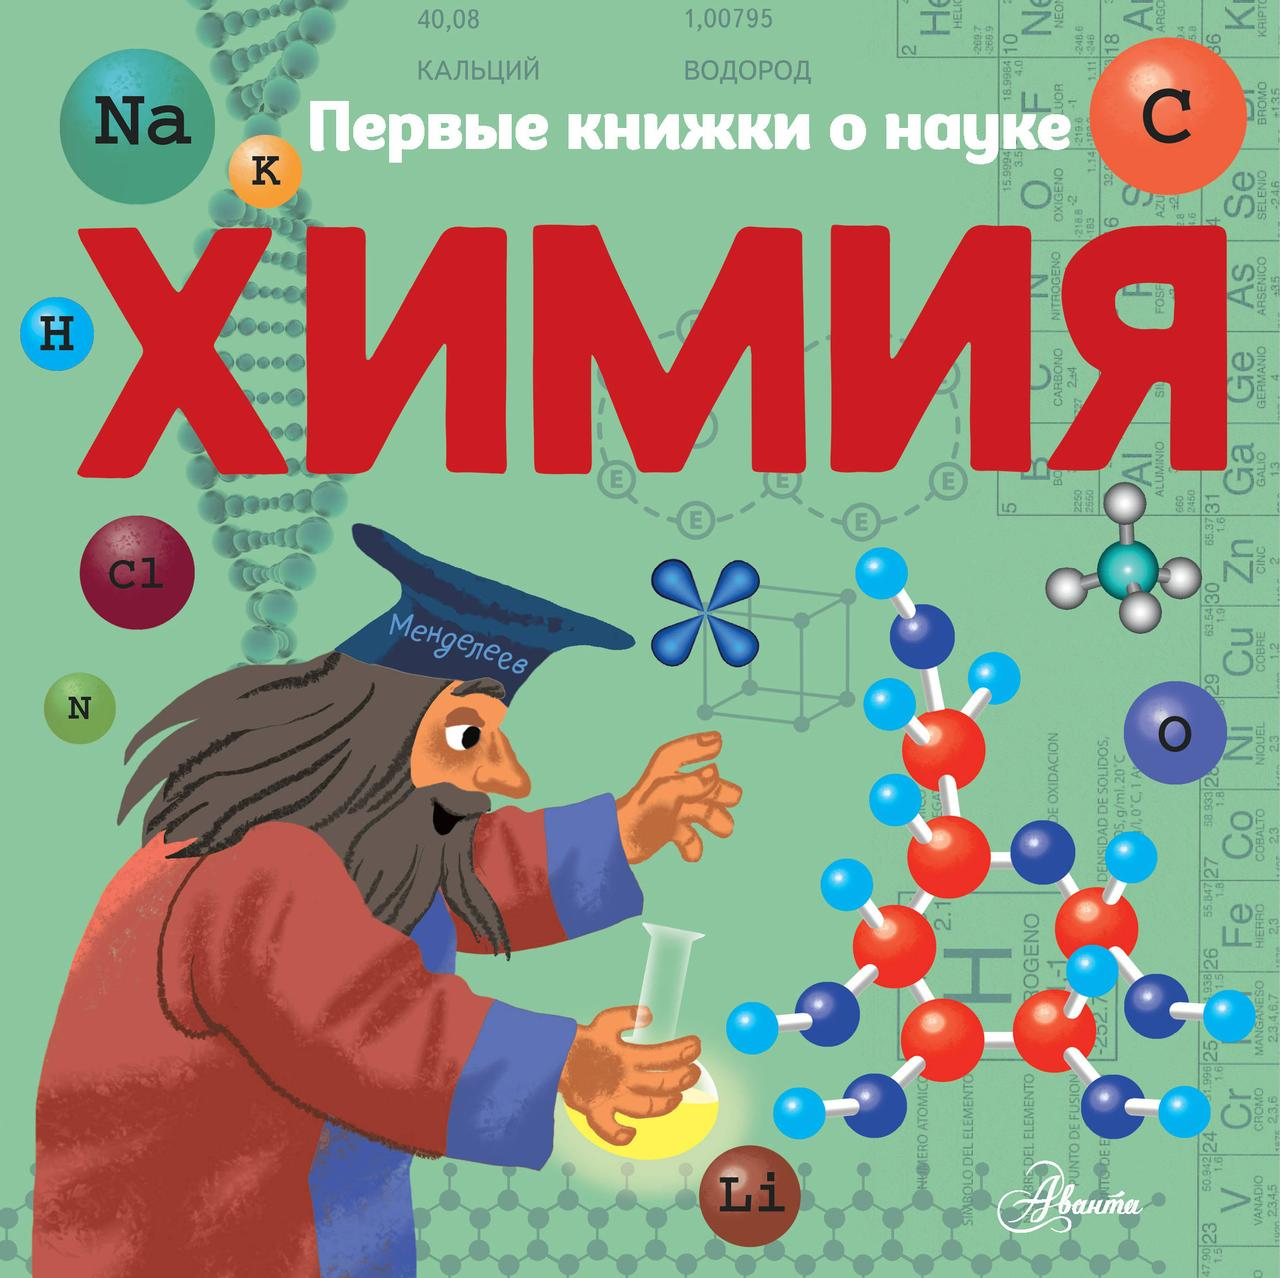 Бобков Павел Владимирович Химия - Бобков Павел Владимирович